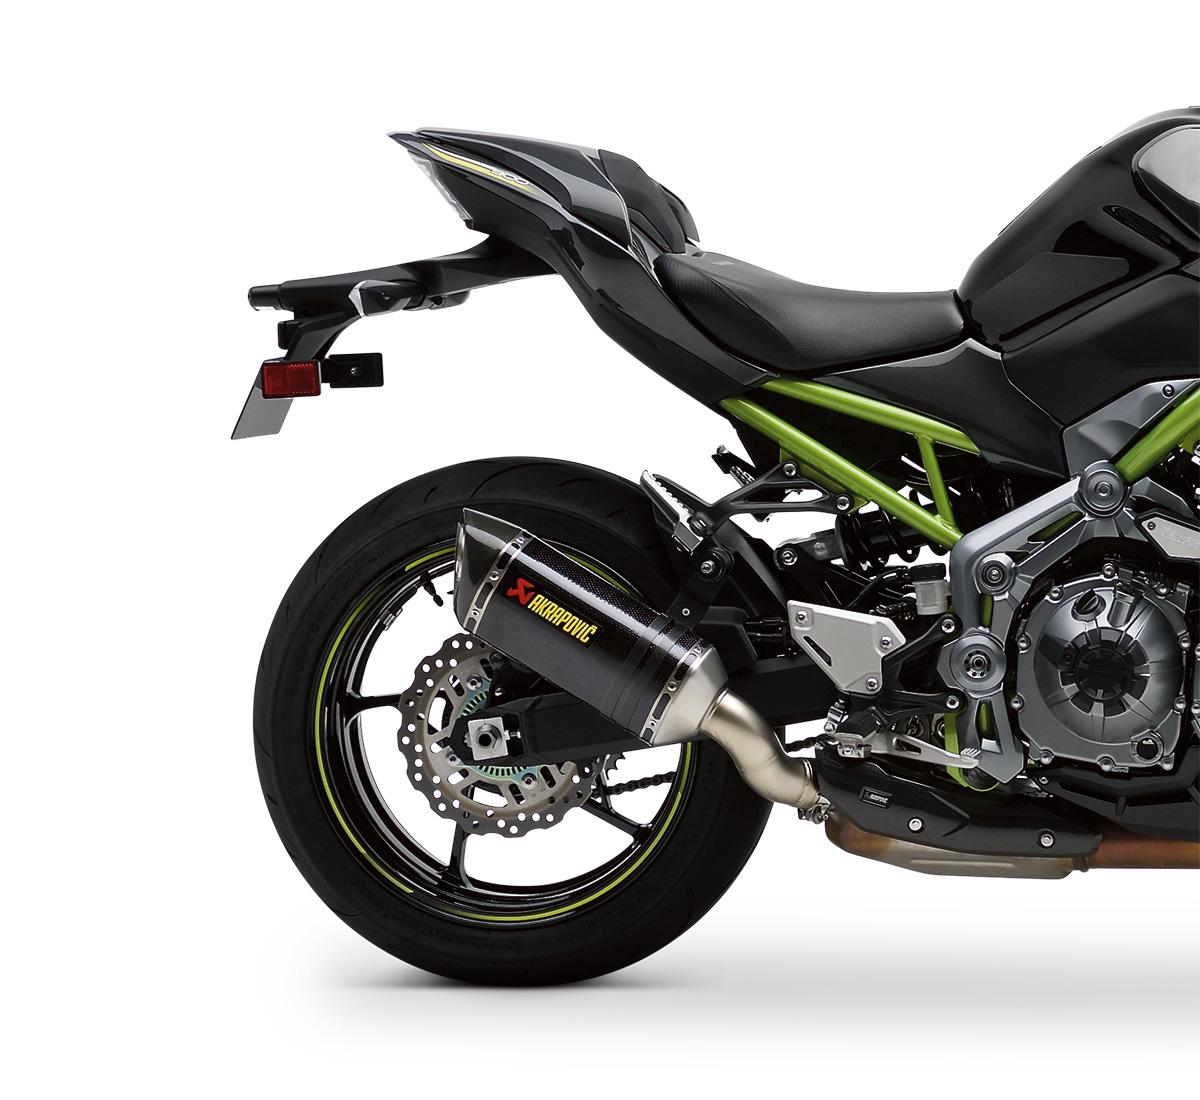 Fonkelnieuw Motorcycle Z900 Akrapovic Slip-On Exhaust BG-56